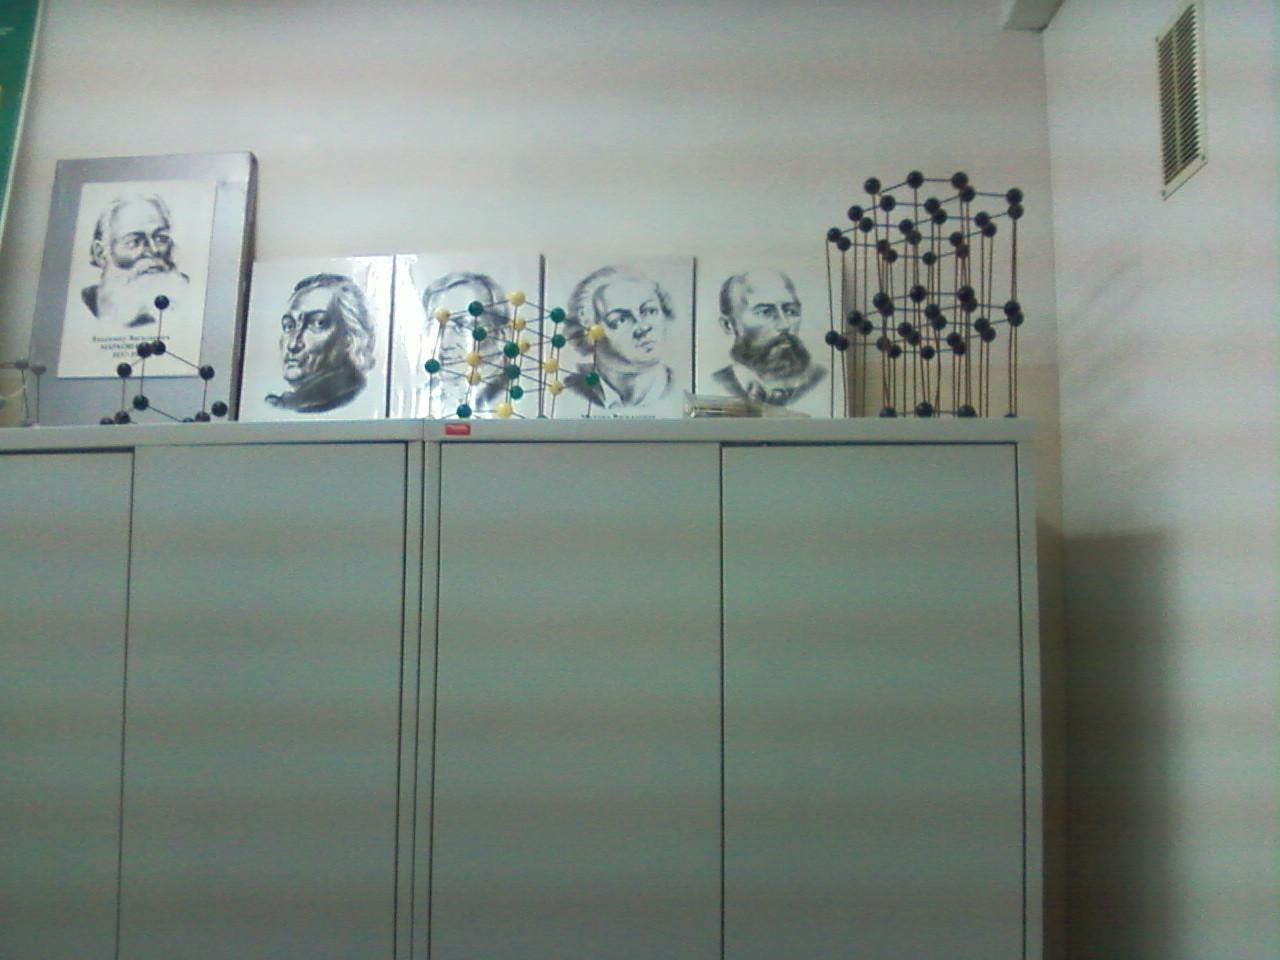 Задняя стена лаборатории. Шкафы для реактивов